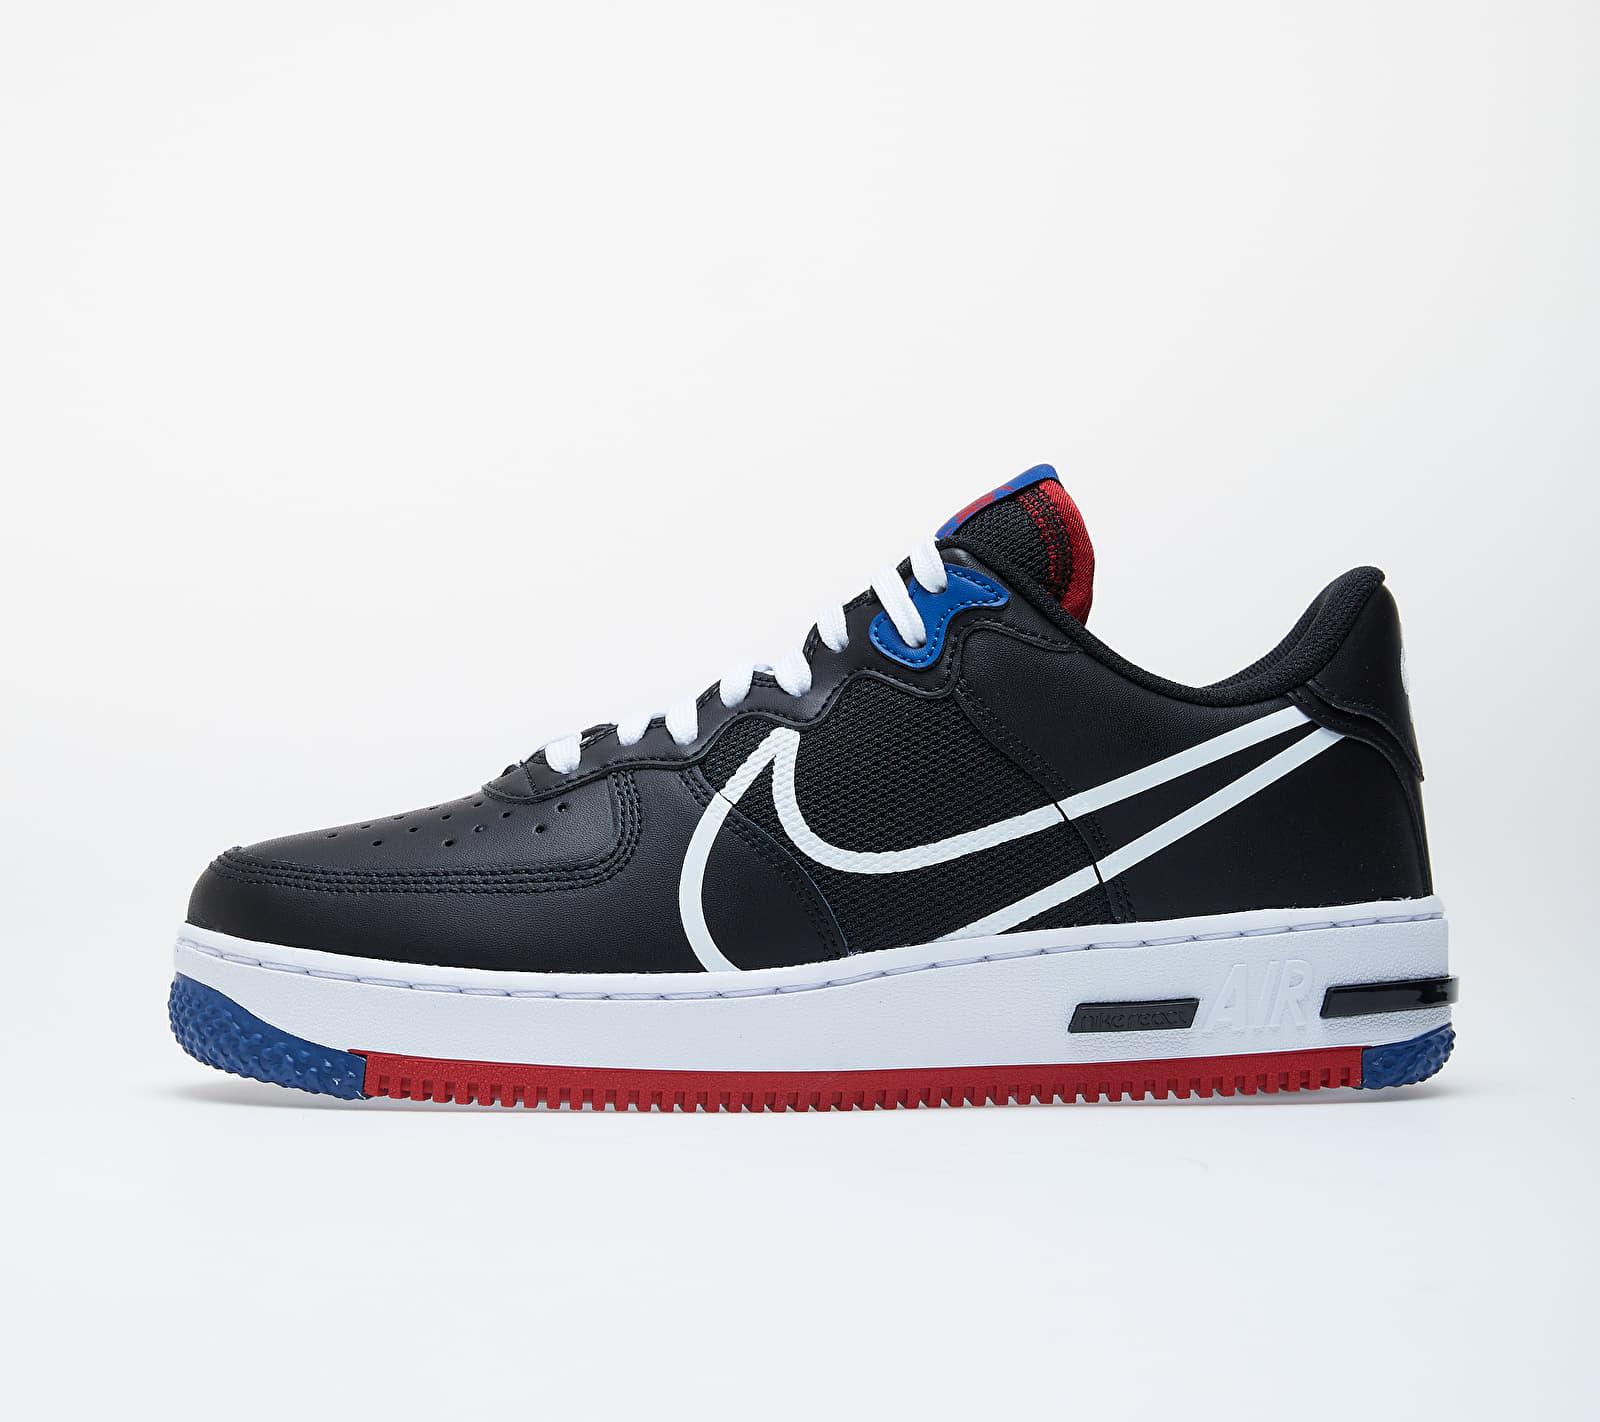 Nike Air Force 1 React Black/ White-Gym Red-Gym Blue EUR 42.5